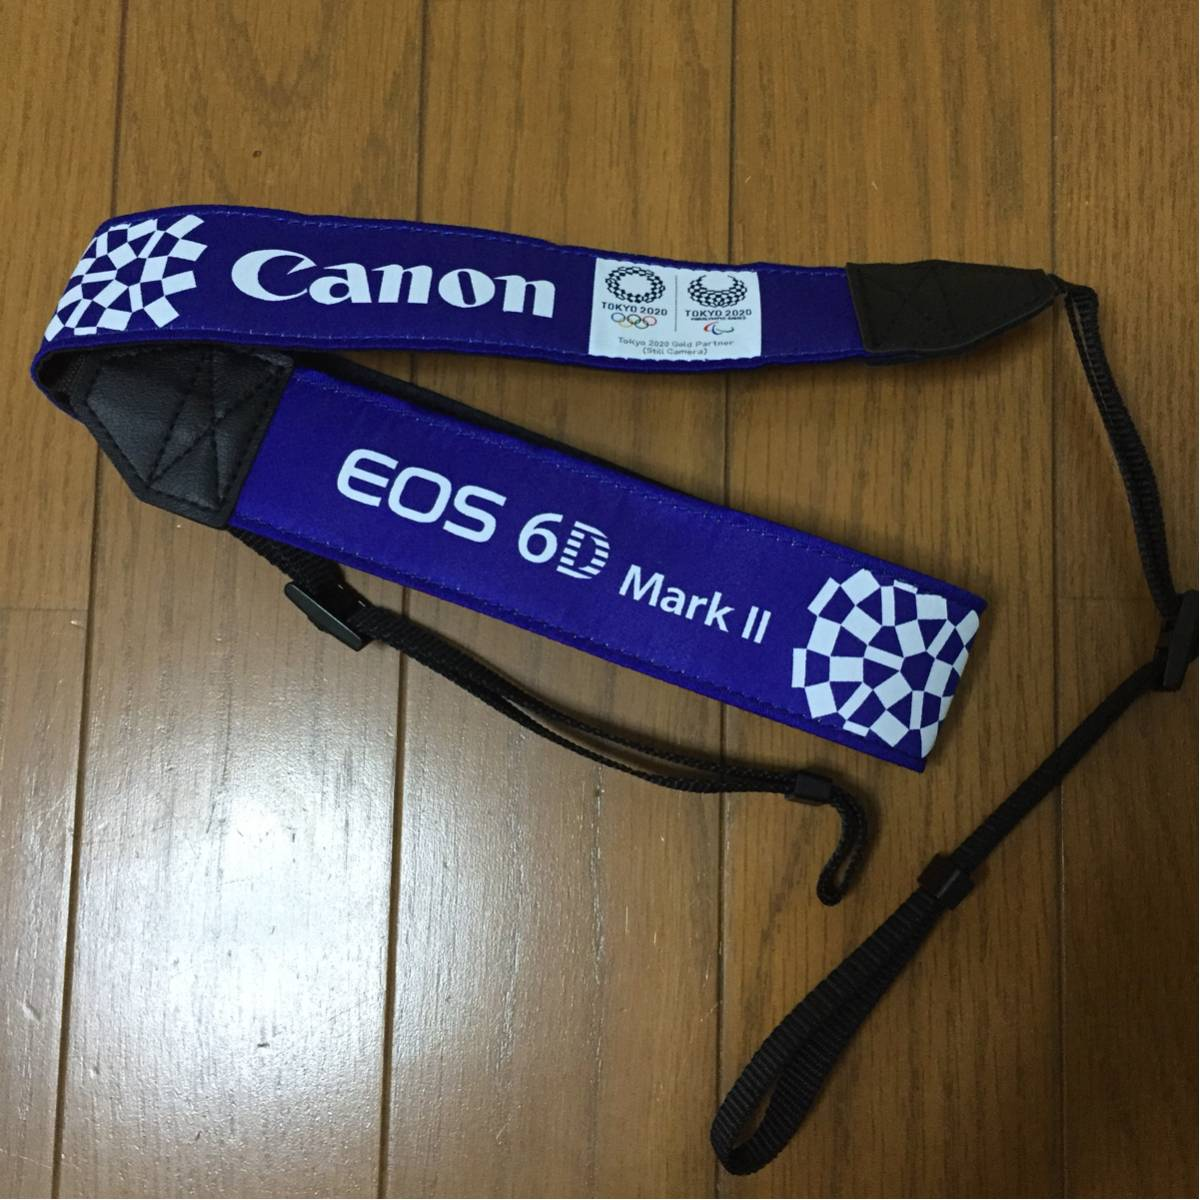 Canon EOS 6D markⅡ 発売記念ストラップ 非売品 限定 東京オリンピック2020 定形外送料無料